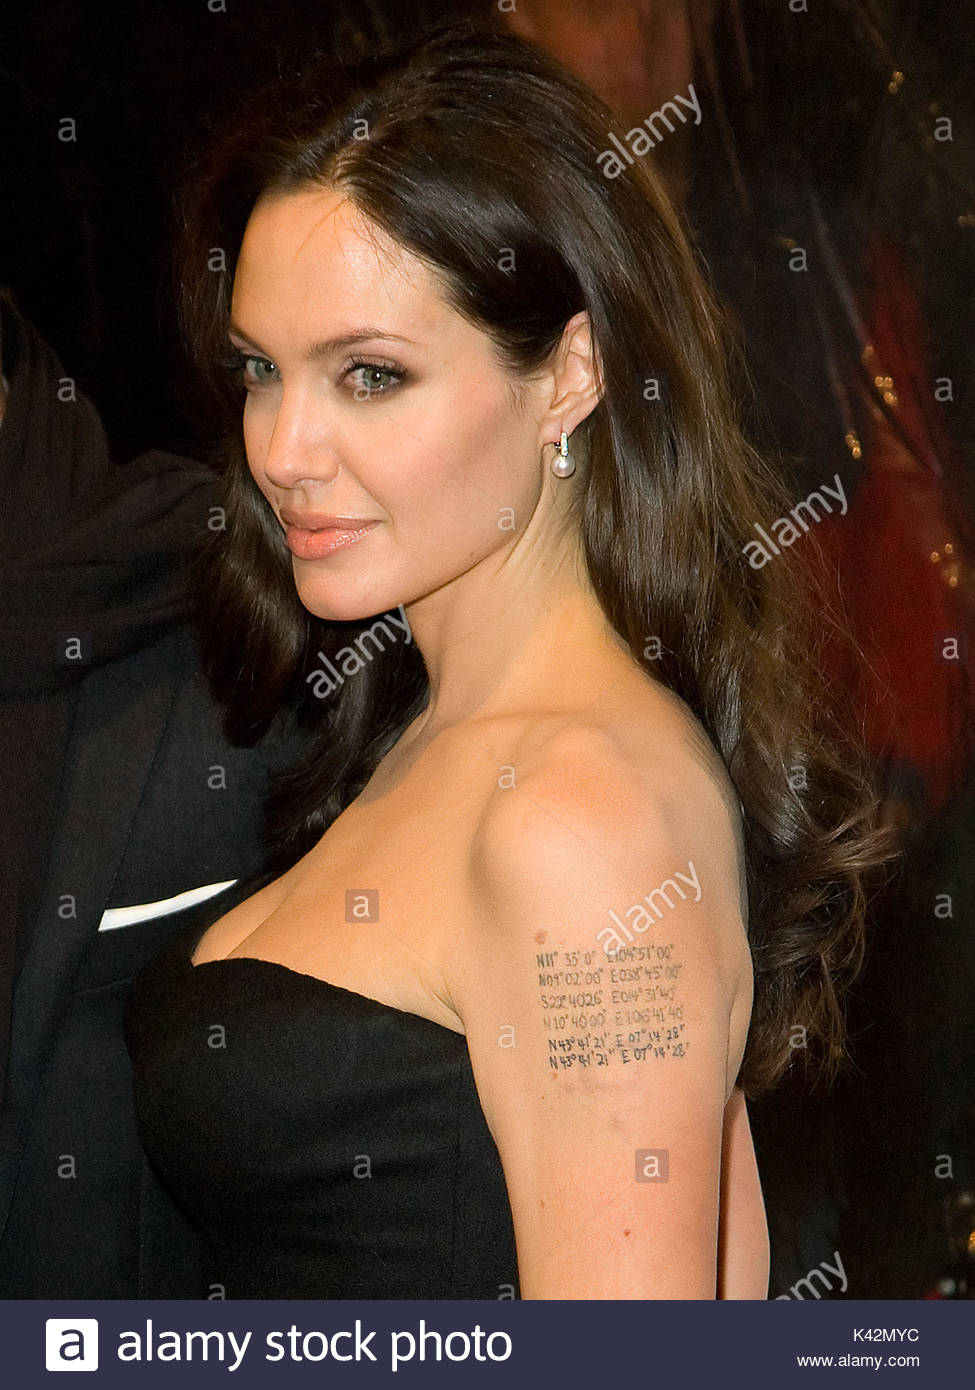 Angelina Jolie Angelina Jolie S Tatouages Et Leurs Significations